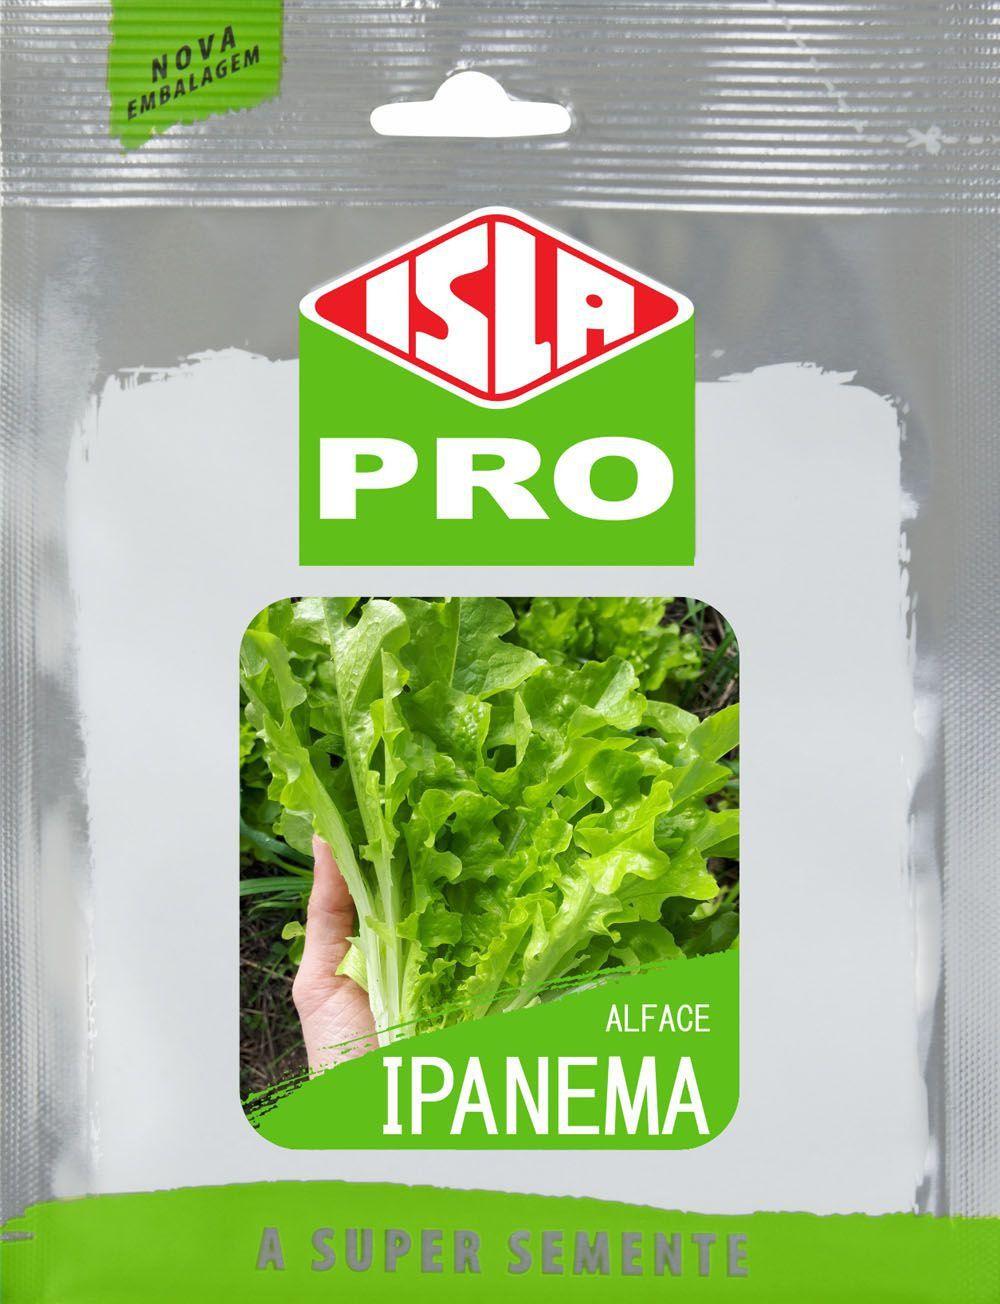 Sementes Importadas de Alface Ipanema Envelope com 100 sementes - Isla Pro